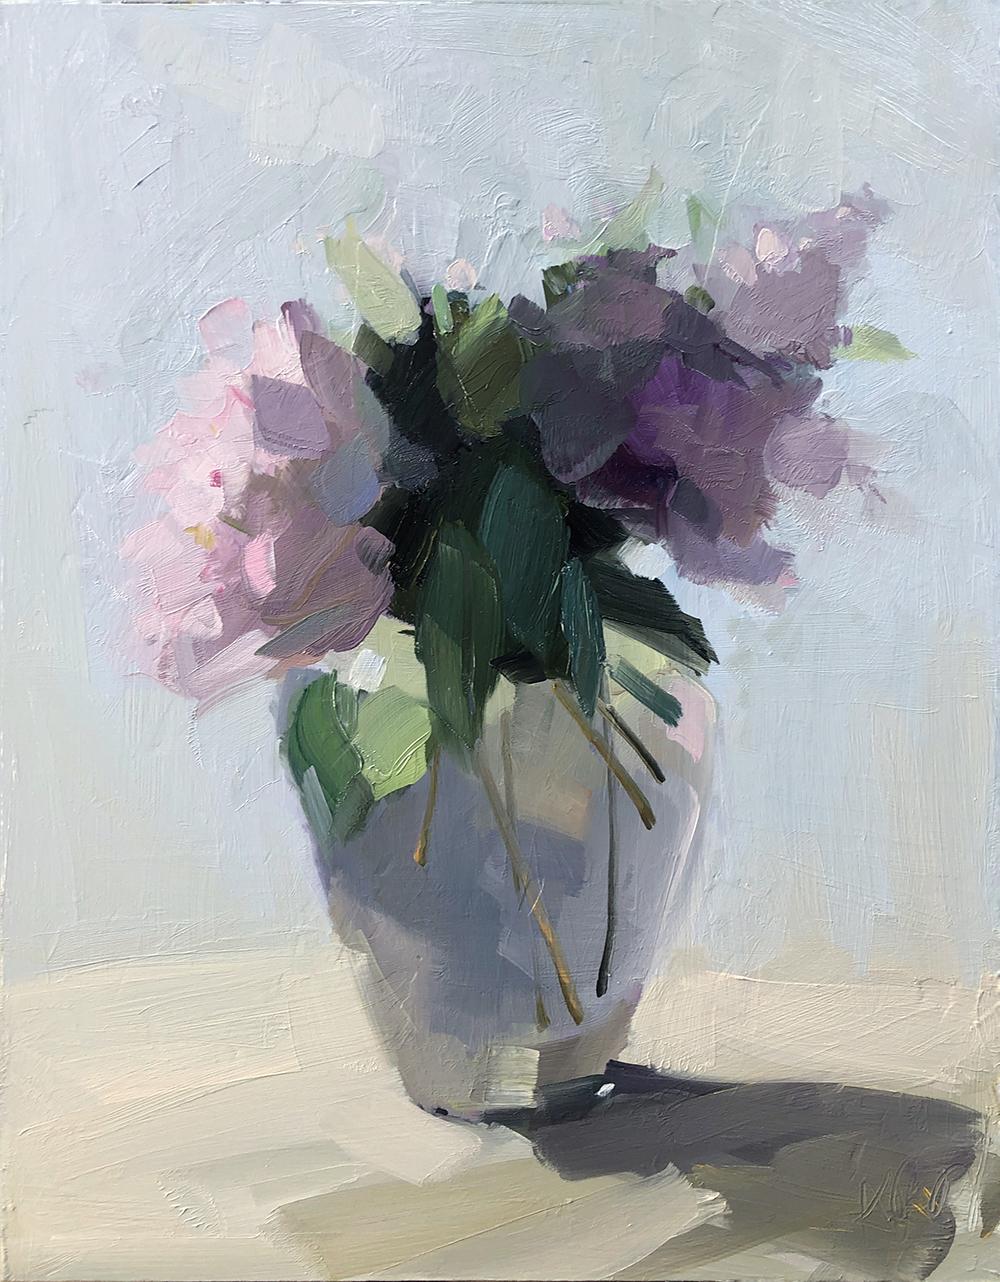 Peonies and Irises, 16 x 12, oil on panel.